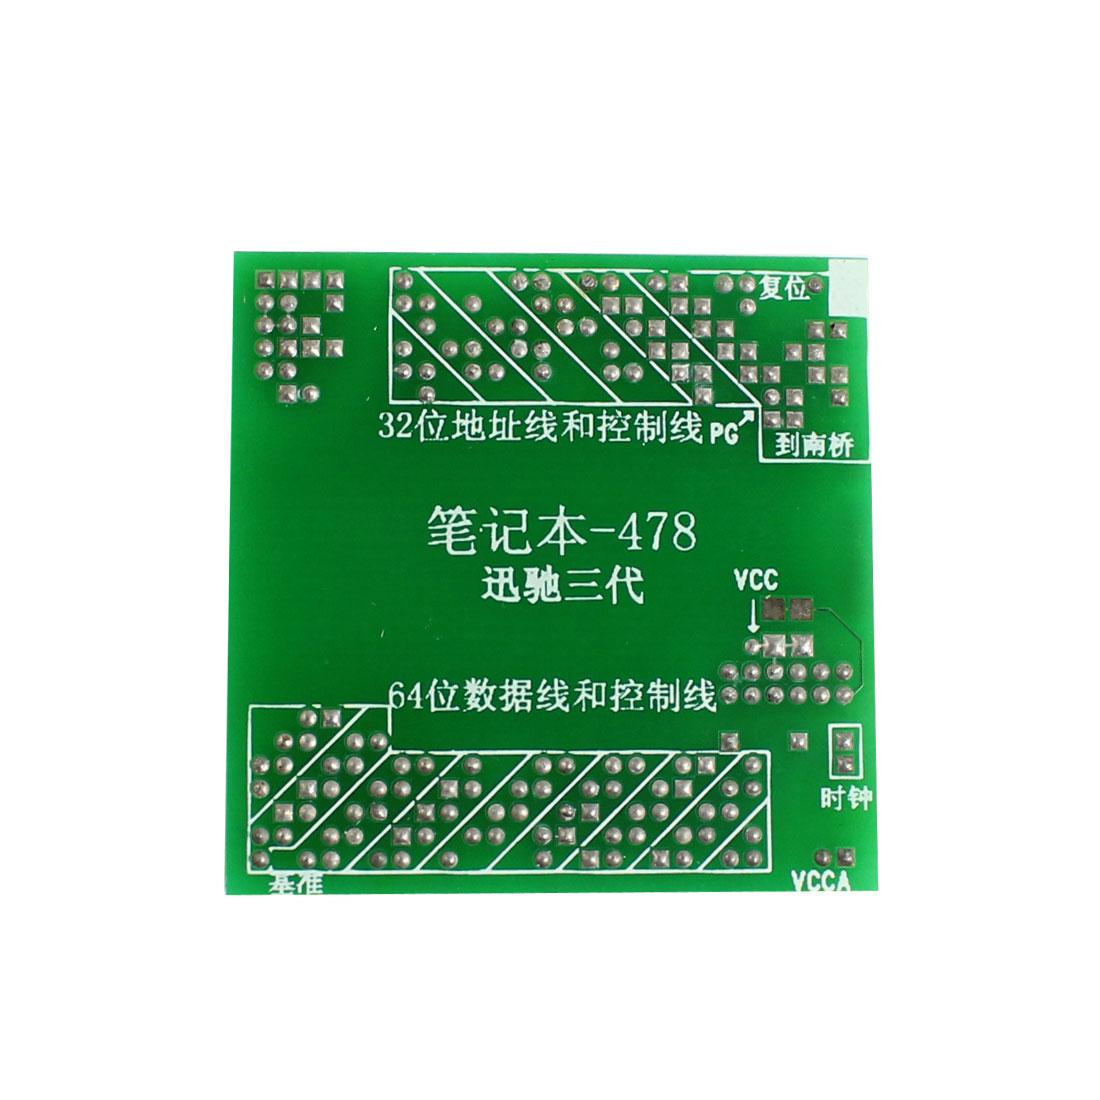 Laptop Notebook 478 CPU Socket Tester Repair Tools Centrino Three Generations